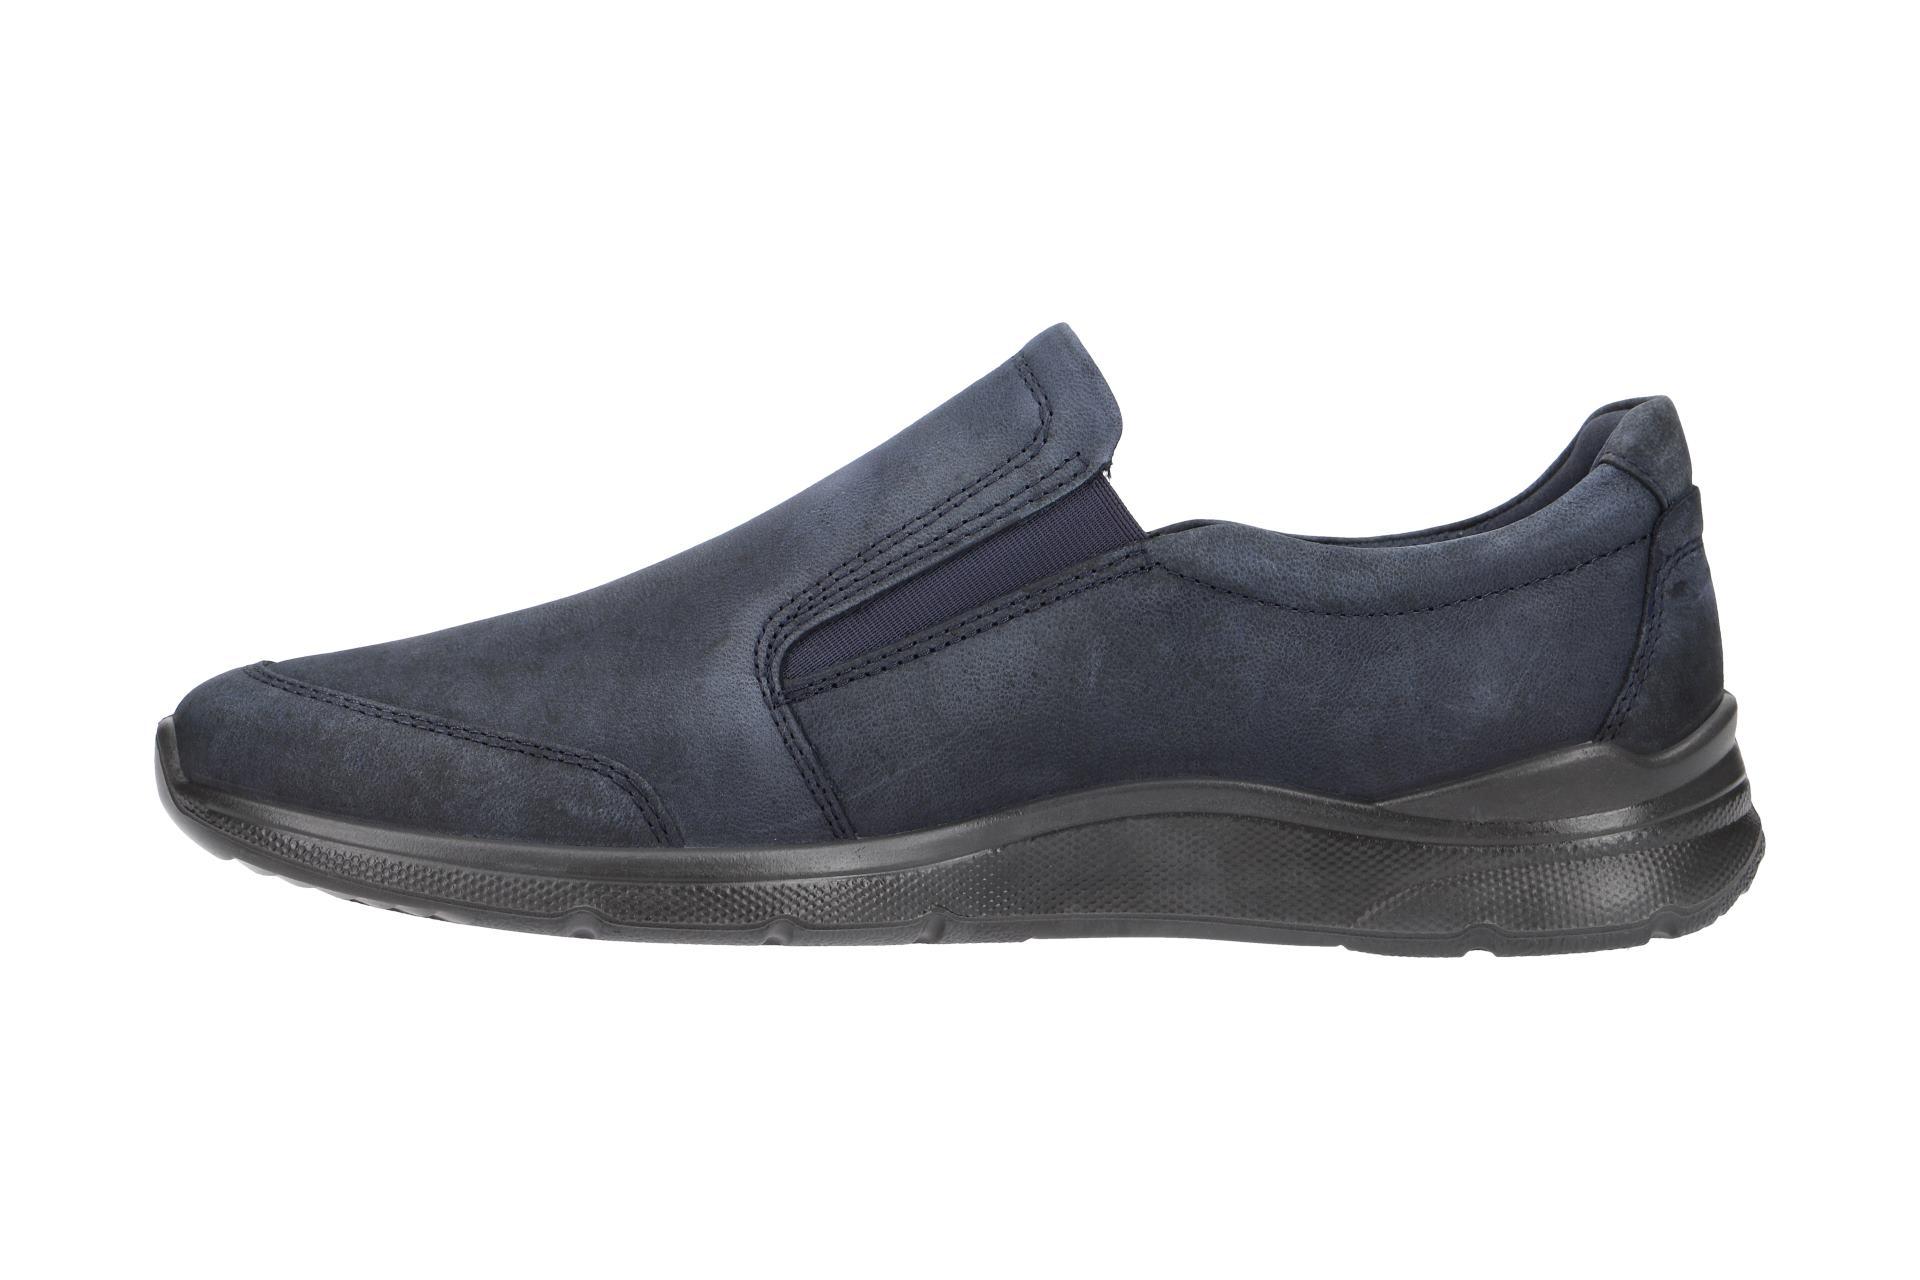 Schuhe Slipper 51168402038 Sportliche Irving Blau Ecco Herrenschuhe 3j4ARL5